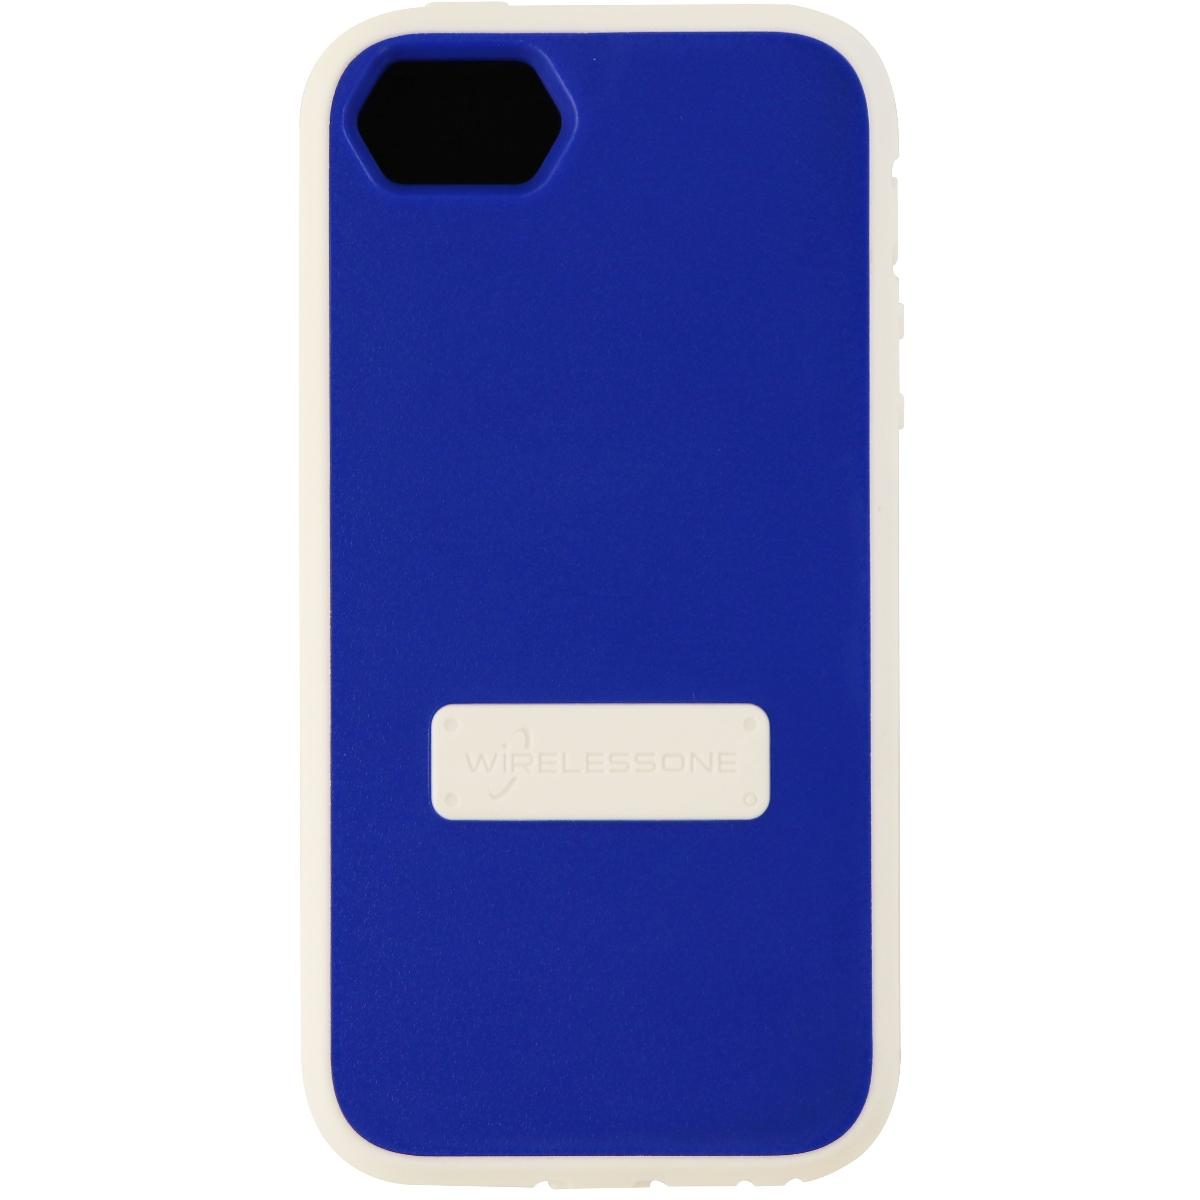 WirelessOne Contour Series Protective Case Cover for iPhone SE 5S 5 - Blue White